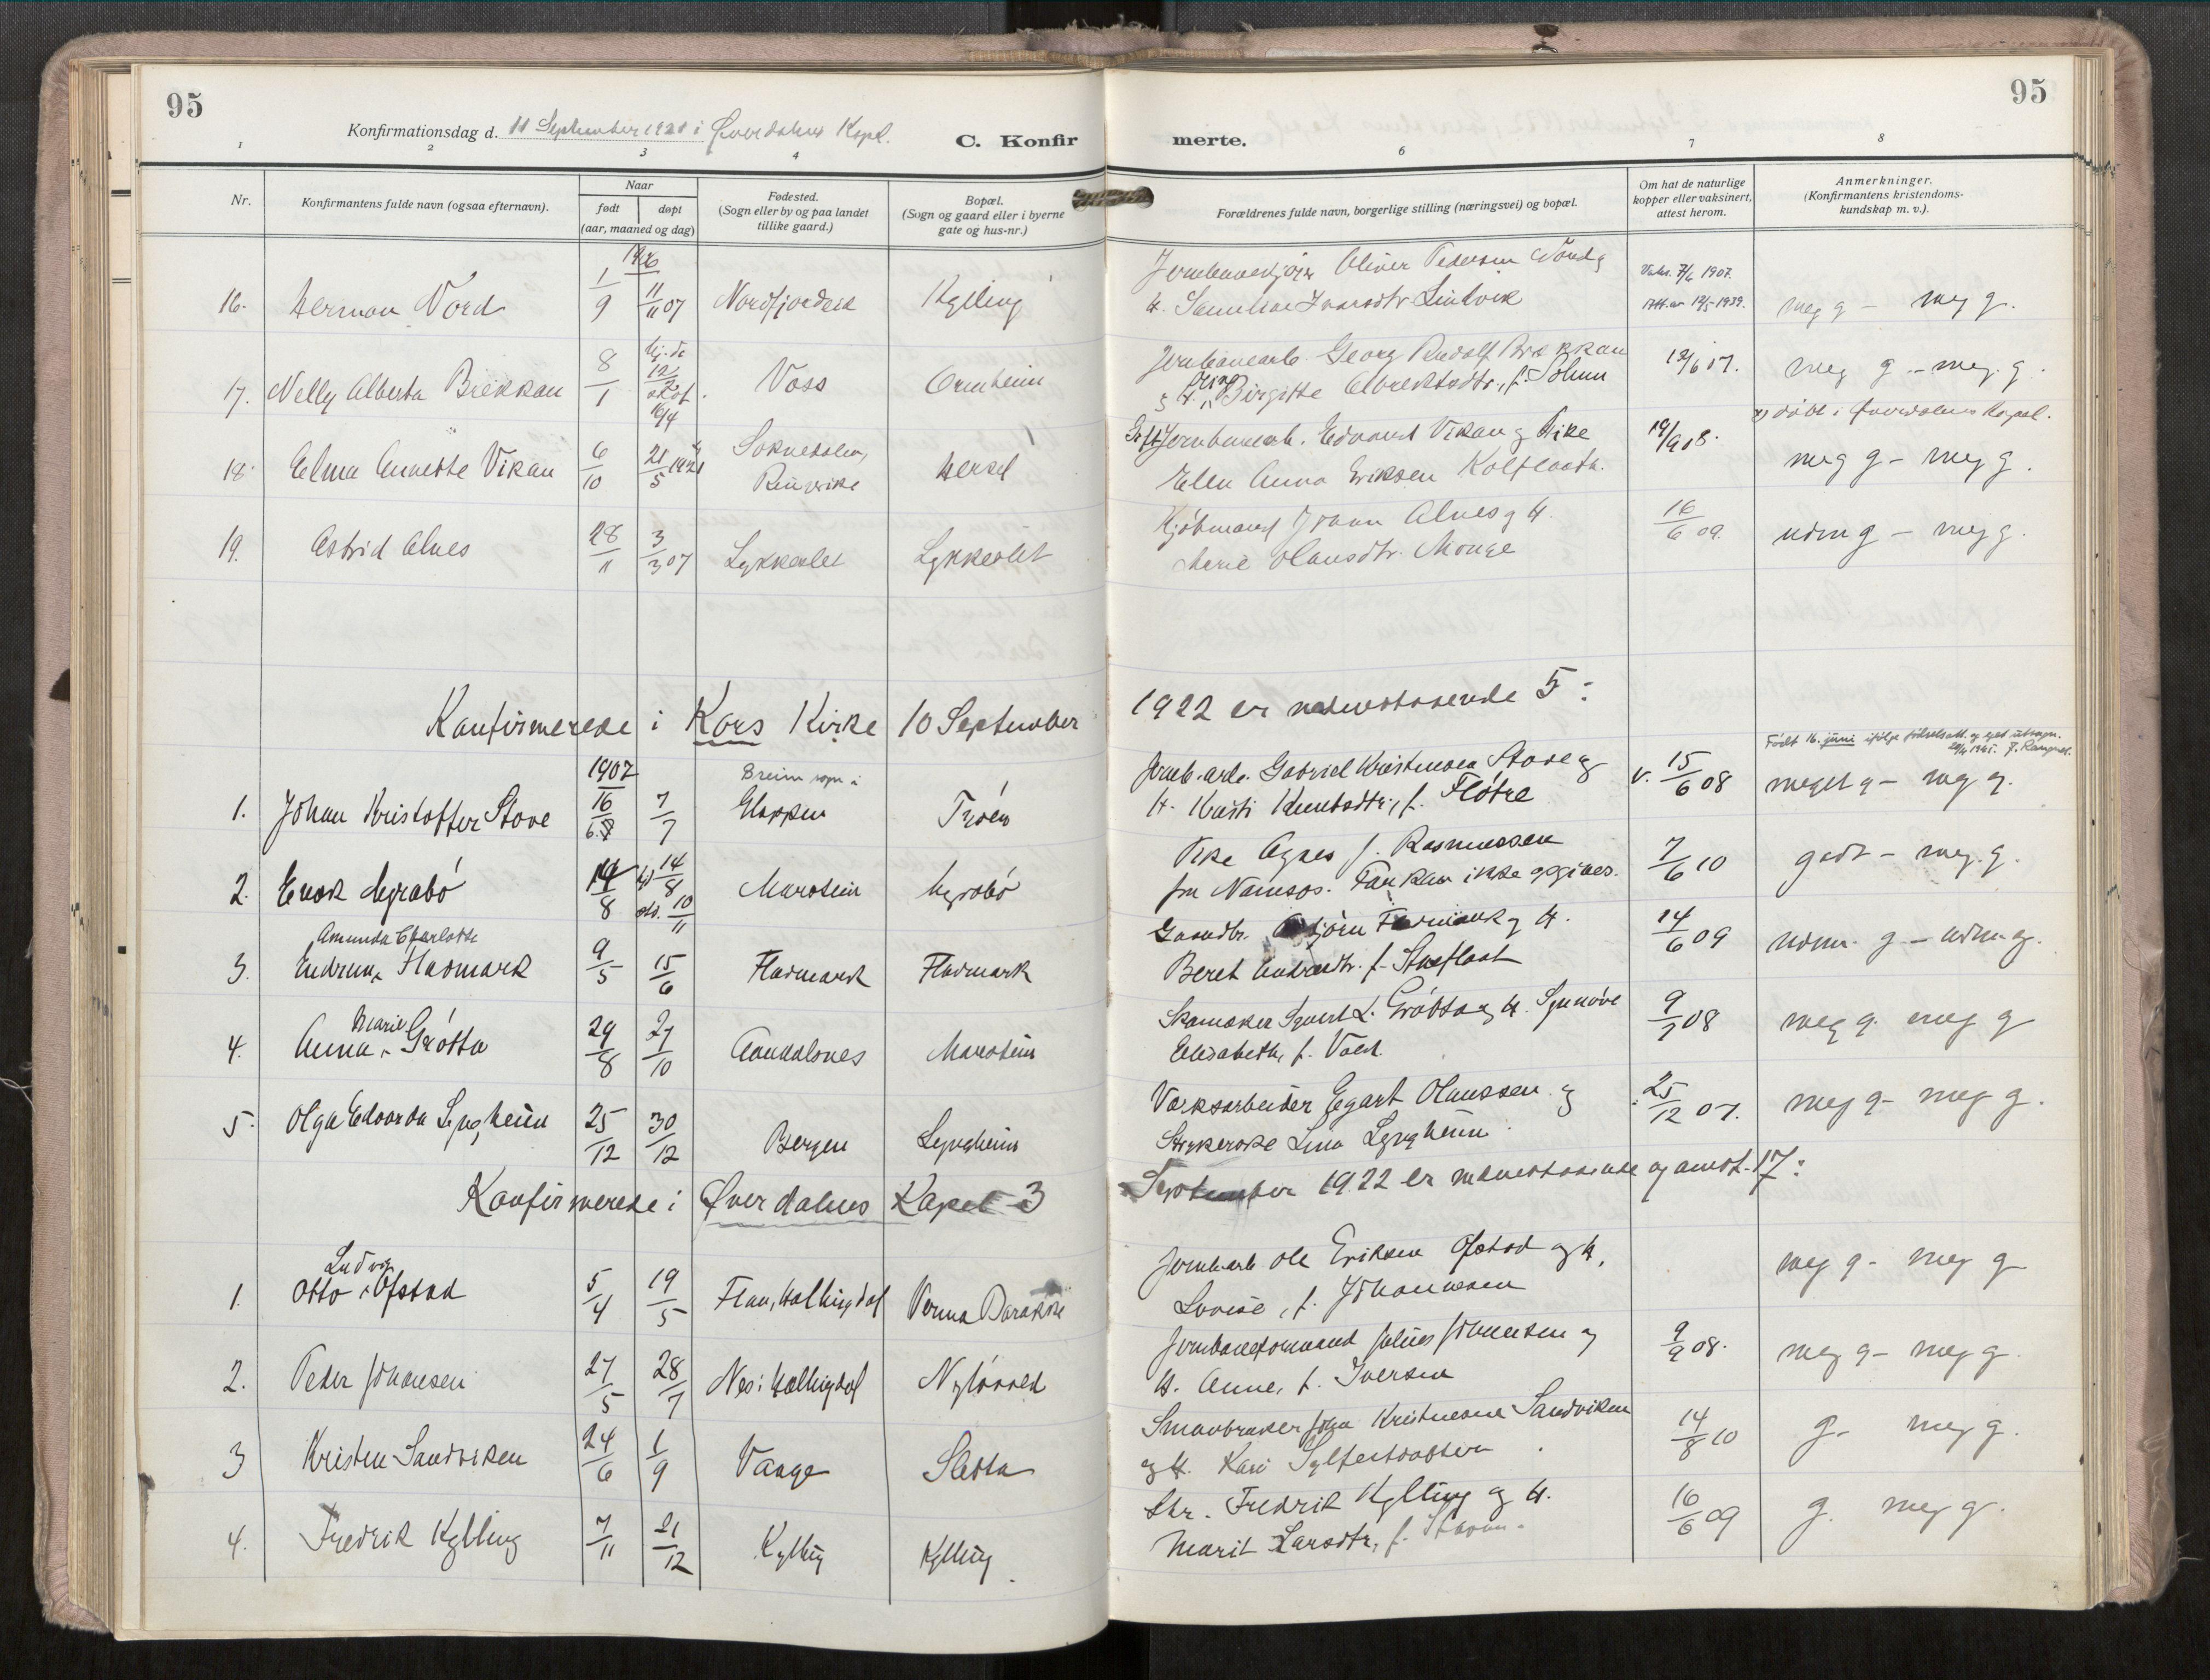 SAT, Grytten sokneprestkontor, Ministerialbok nr. 546A04, 1919-1956, s. 95